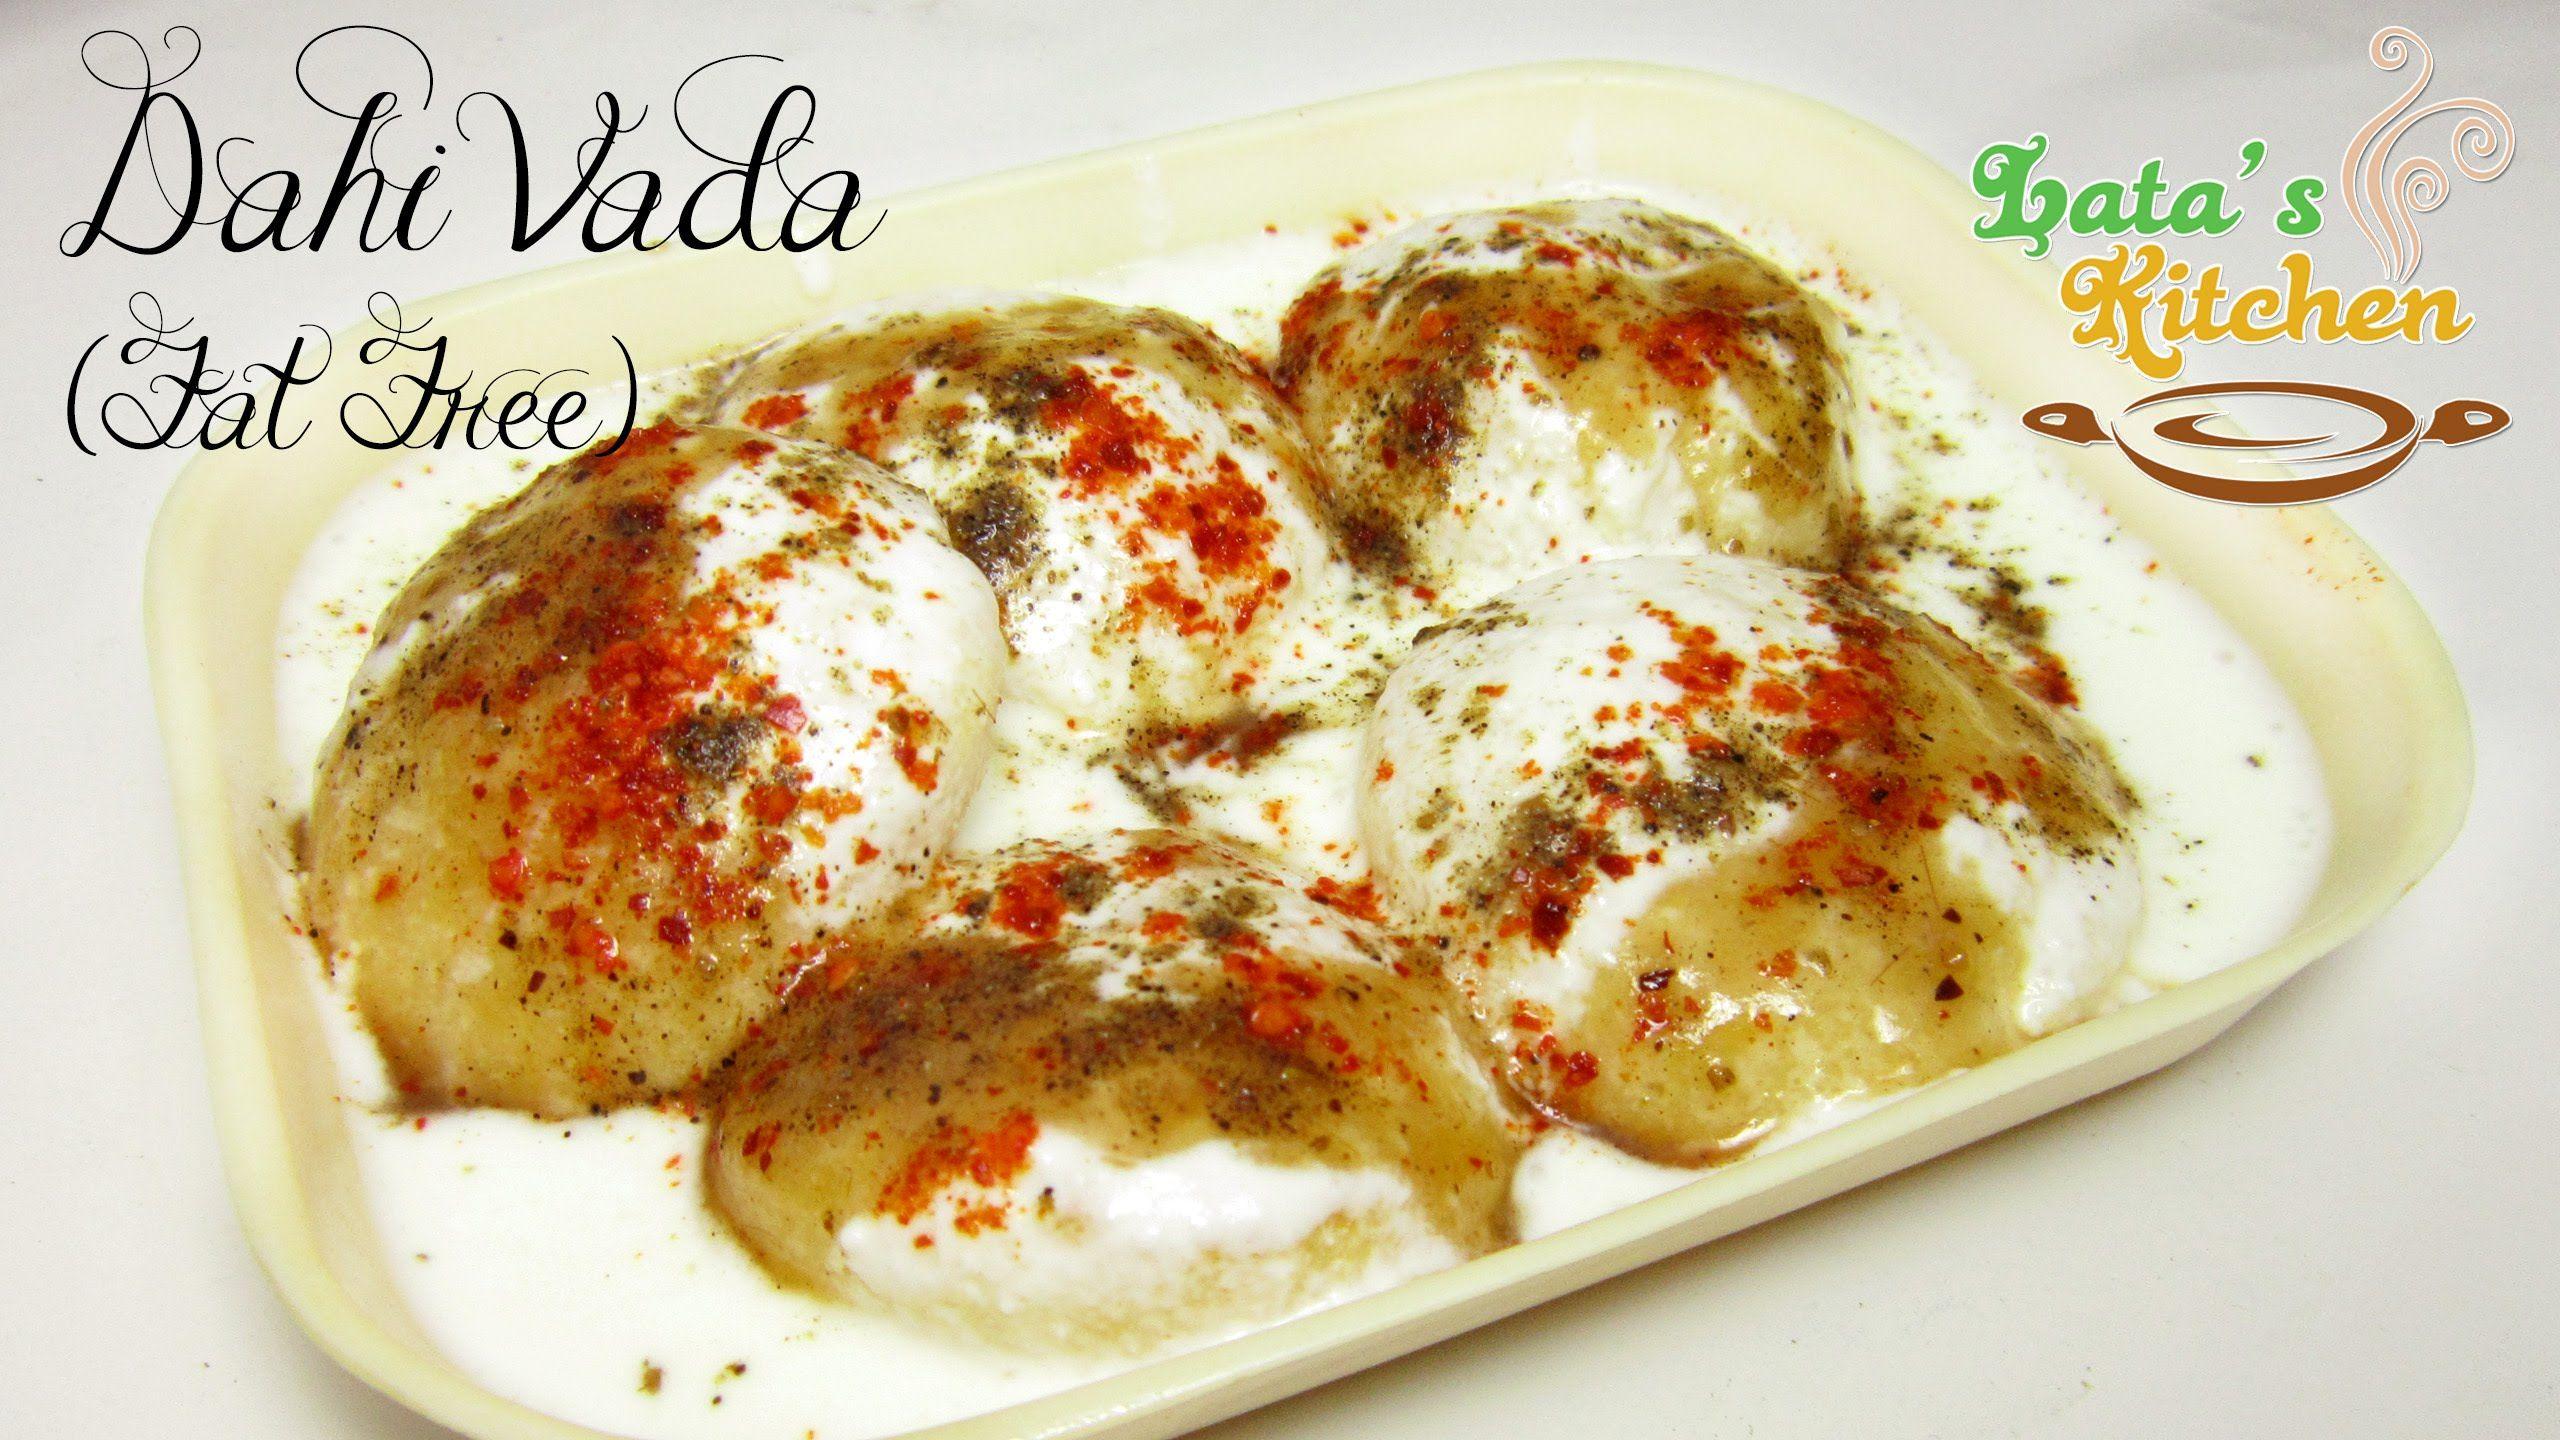 Dahi vada recipe fat free dahi bhalla indian vegetarian recipe dahi vada recipe fat free dahi bhalla indian vegetarian recipe in hindi with english subtitles forumfinder Choice Image